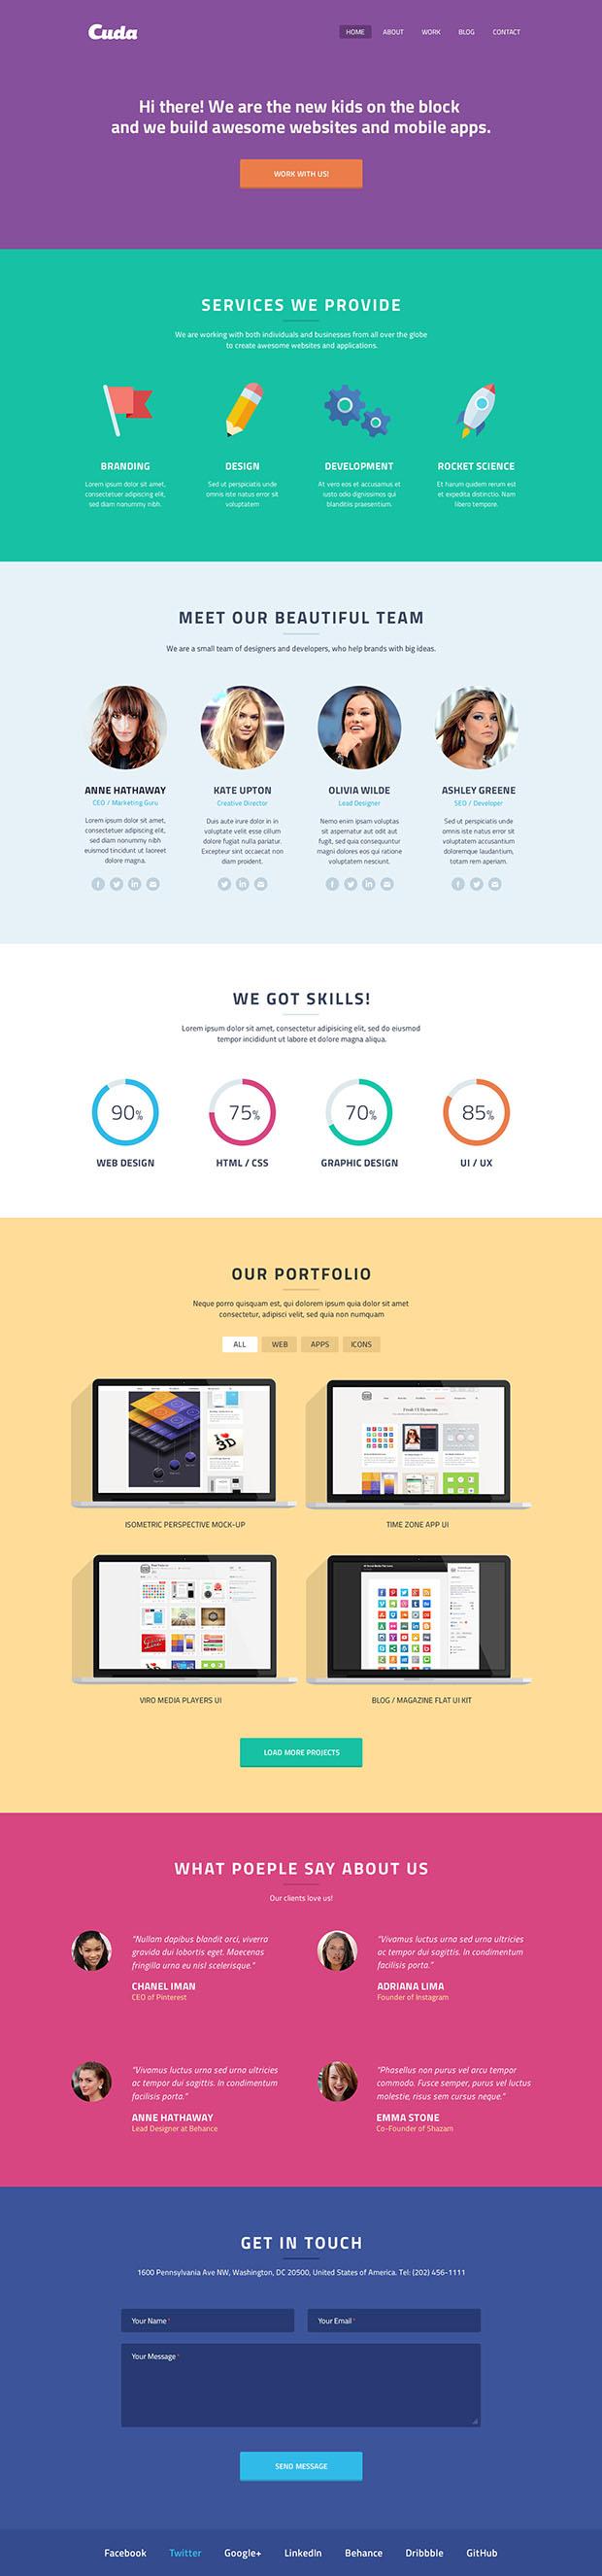 Cuda-Single-Page-Portfolio-full